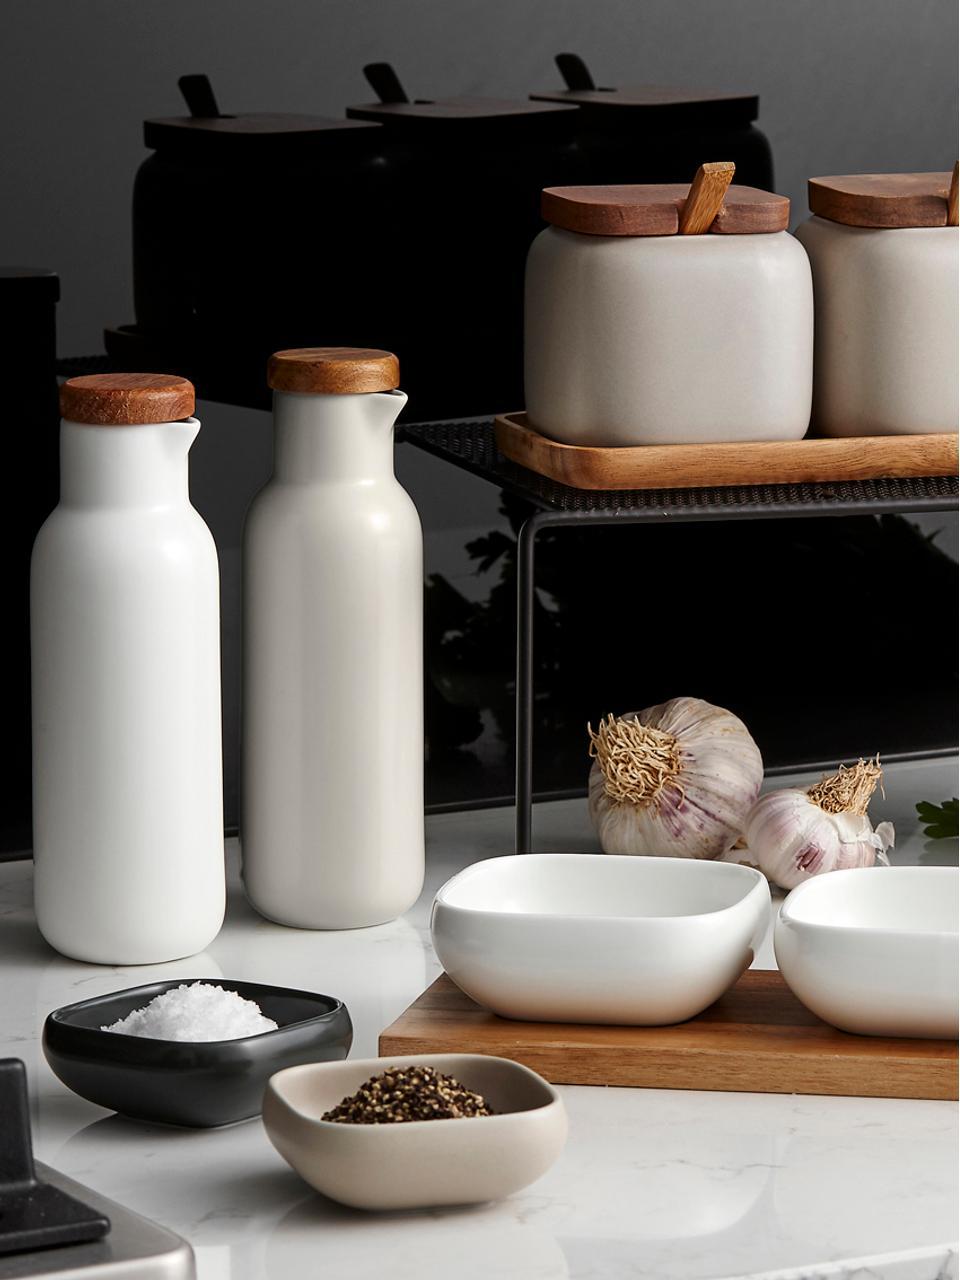 Set olio e aceto Essentials 2 pz, Porcellana, legno d'acacia, Sabbia, bianco, legno di acacia, Ø 6 x Alt. 18 cm